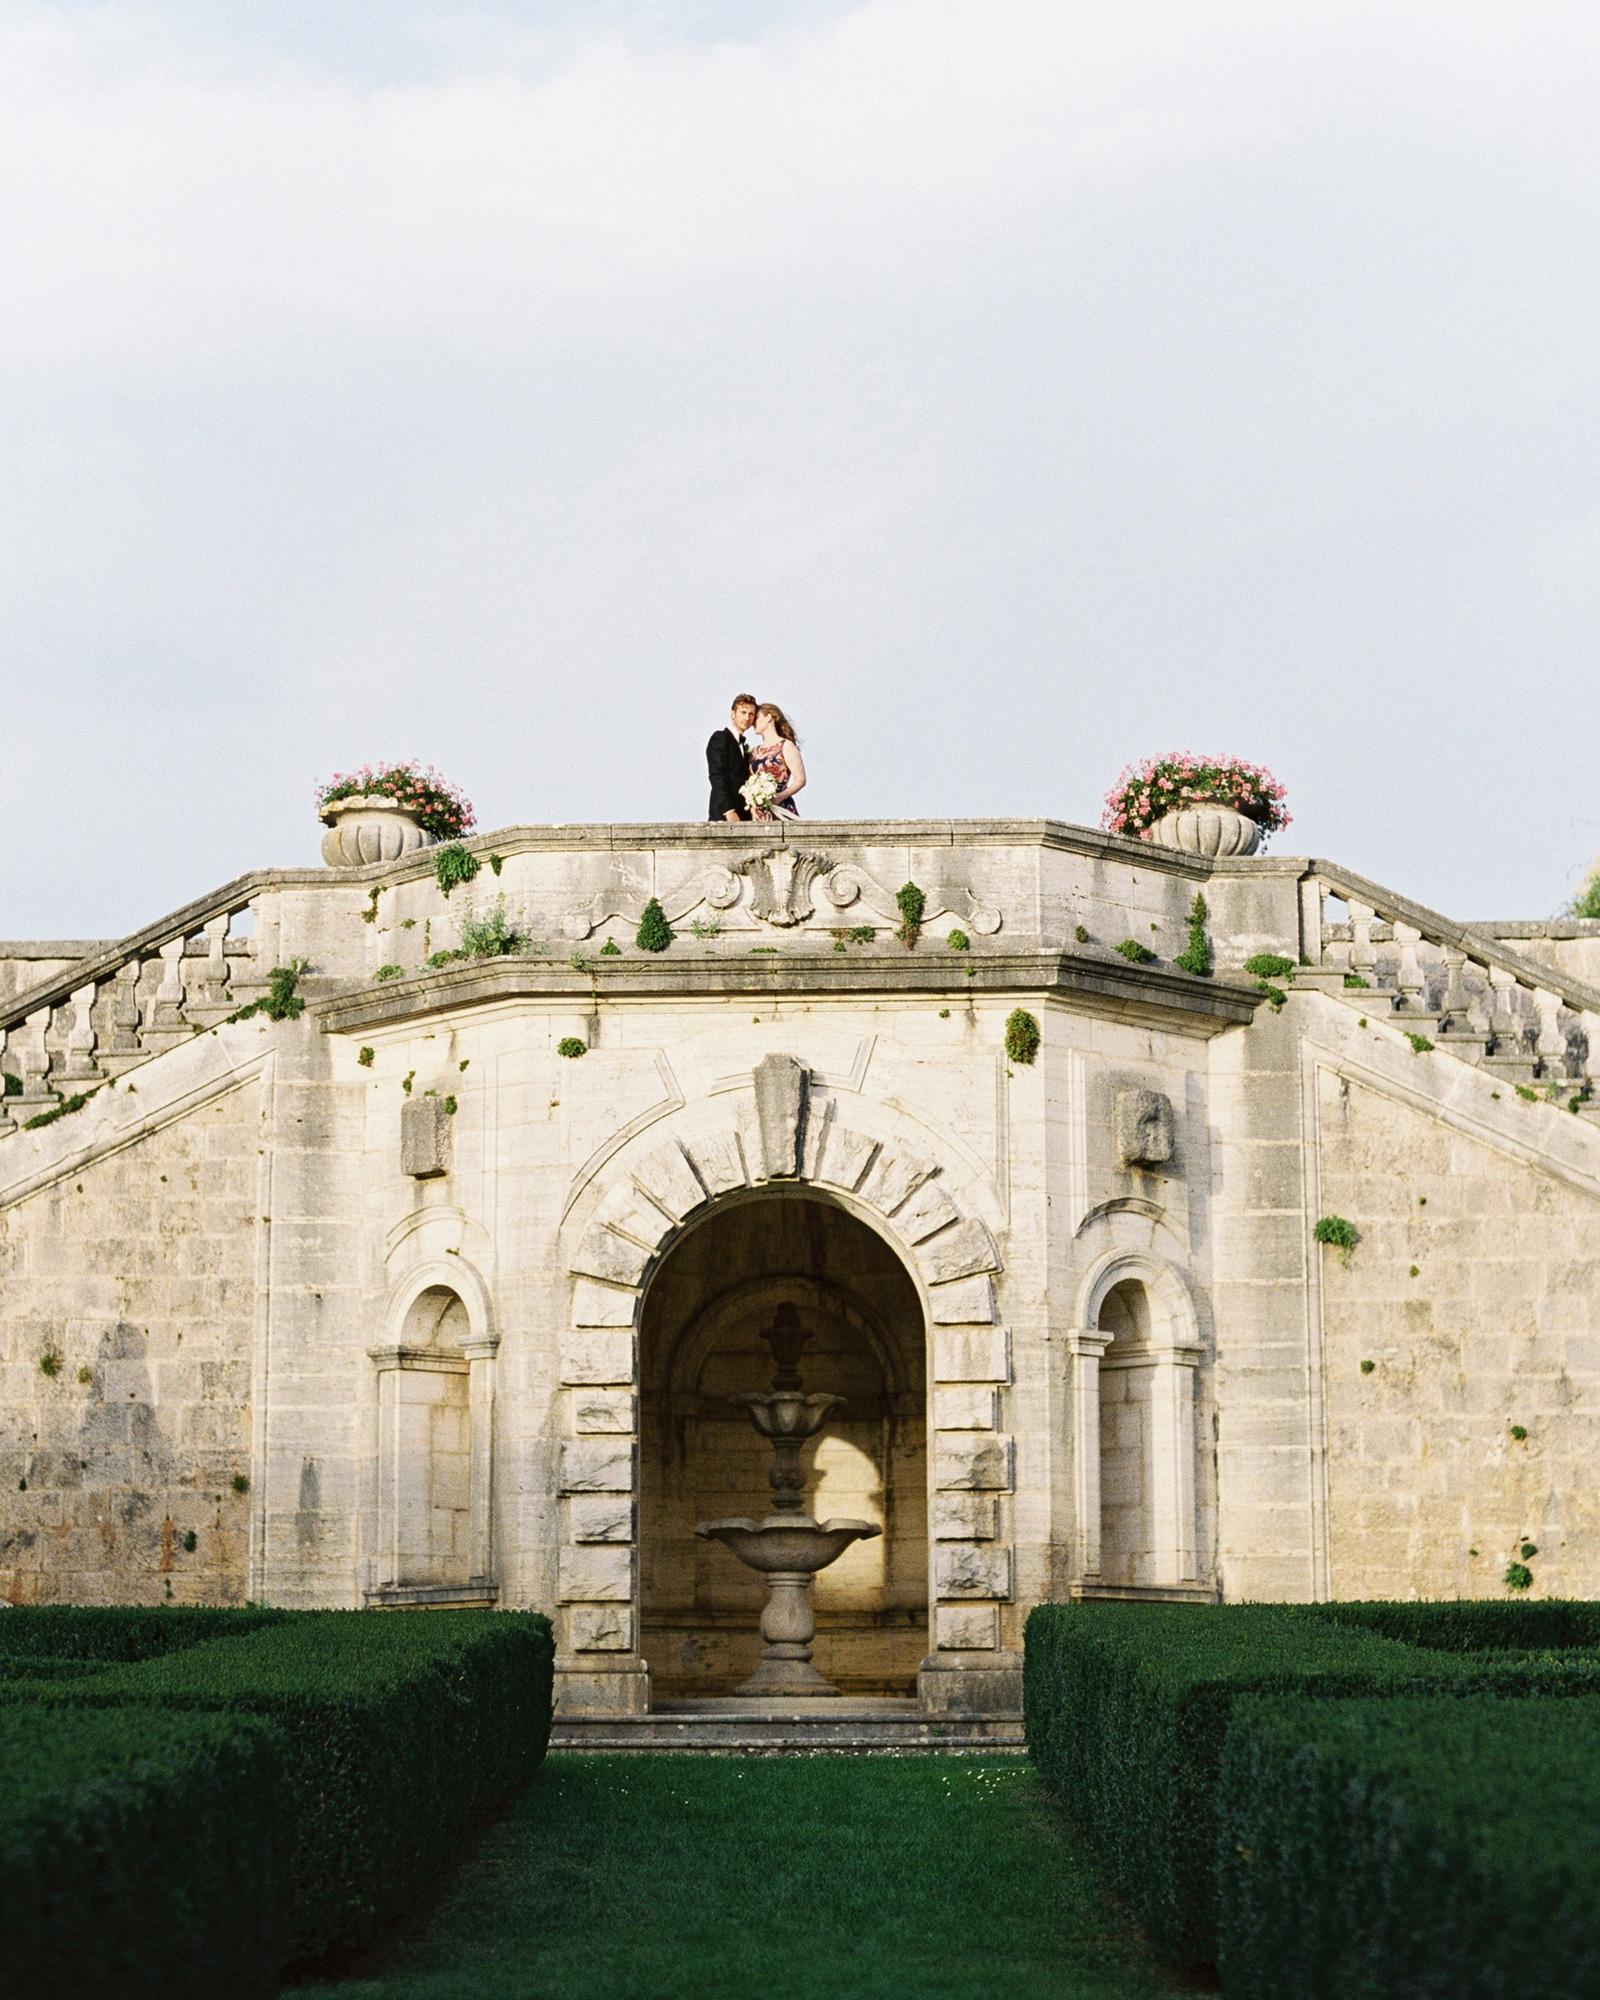 christine-dagan-wedding-couple-italy-4302_04-s113011-0616.jpg